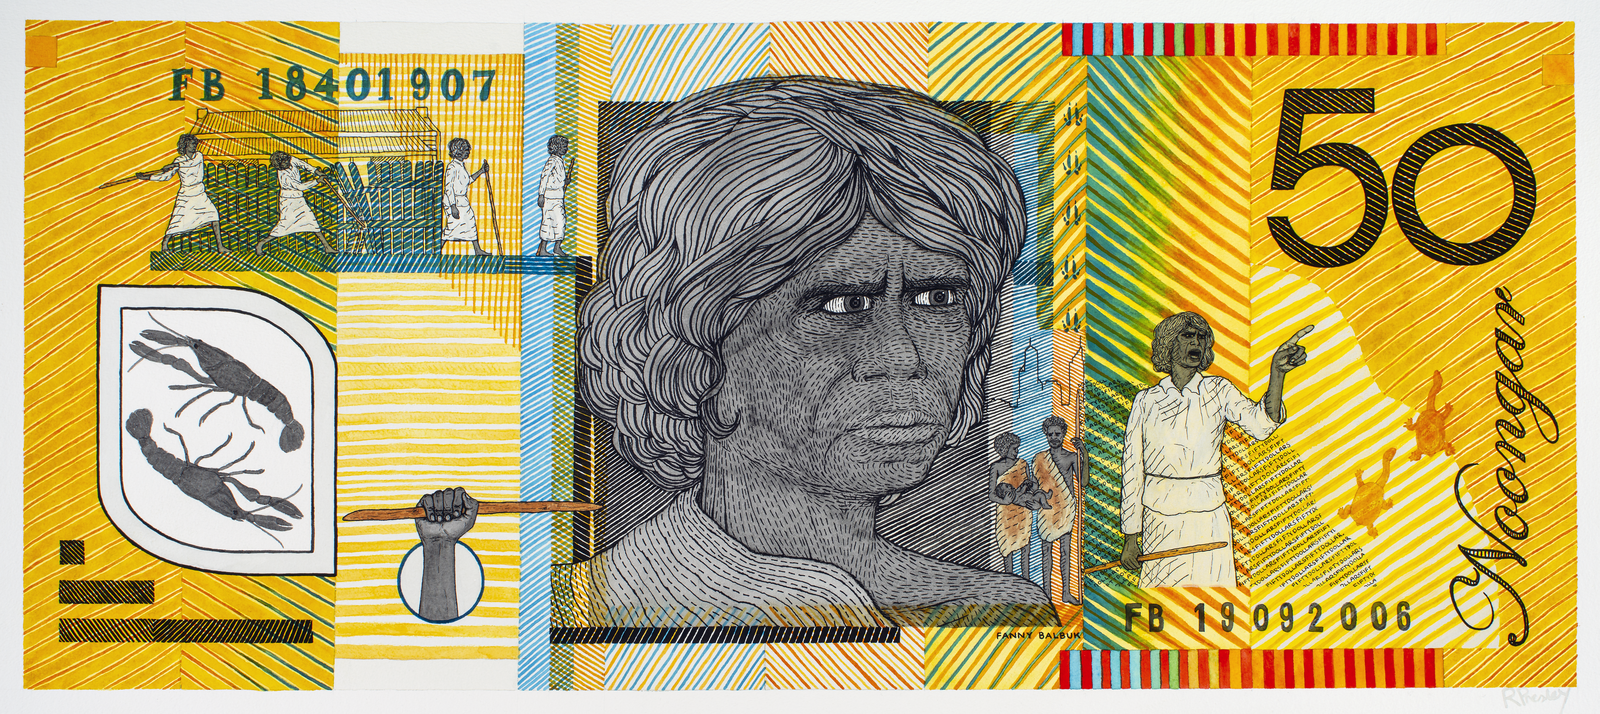 Fanny Balbuk (1840-1907) Blood Money – Fifty Dollar Note – Fanny Balbuk Commemorative 2011